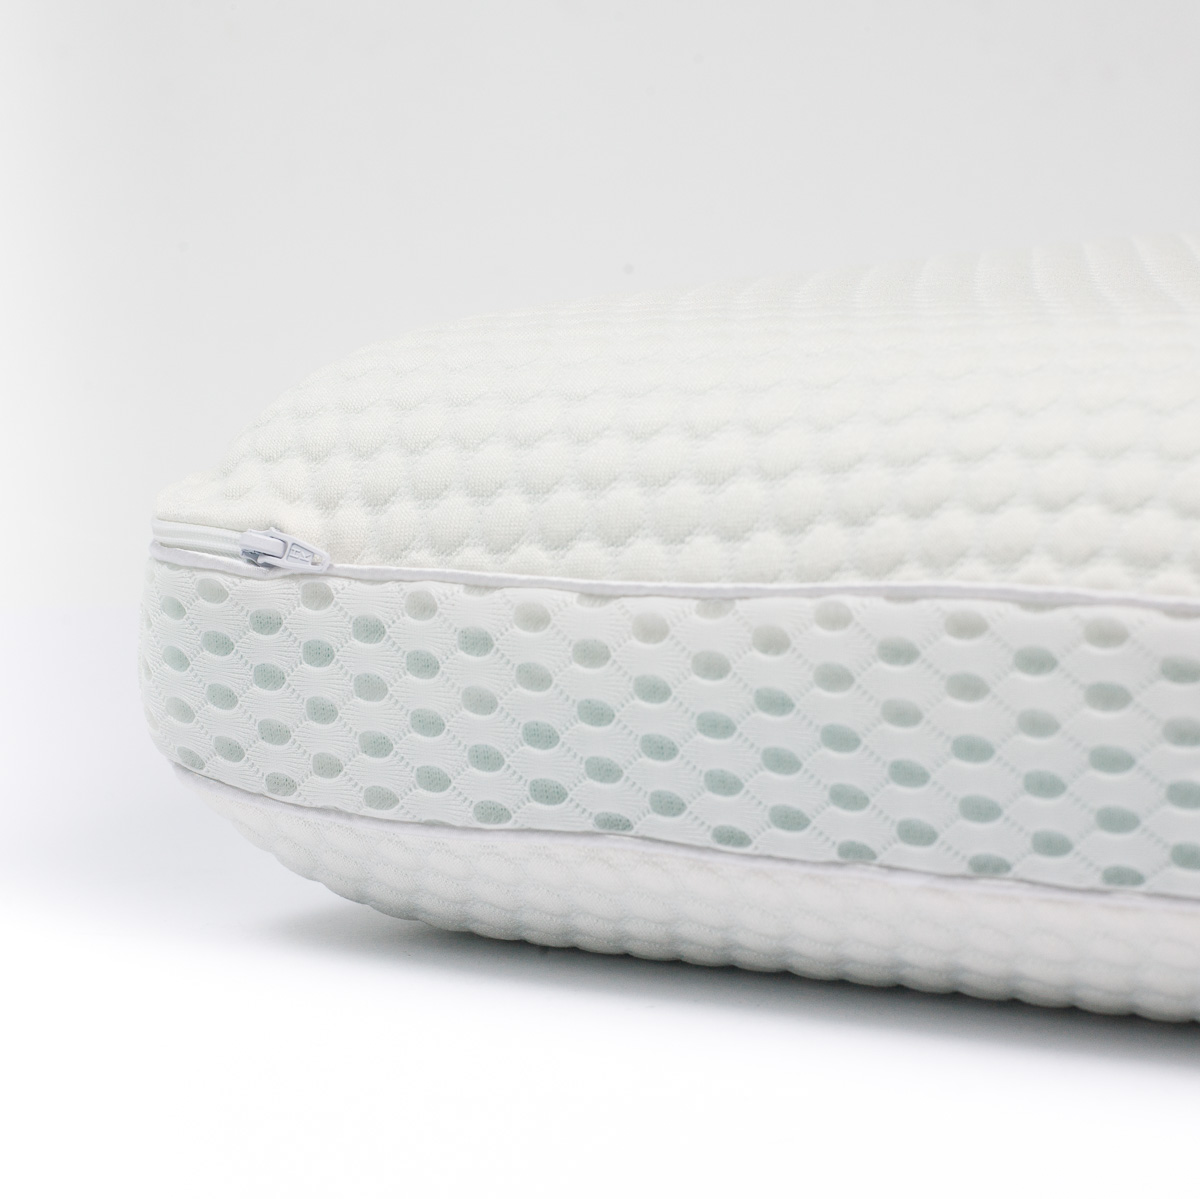 Caseys Sumptuous Memory Pillow